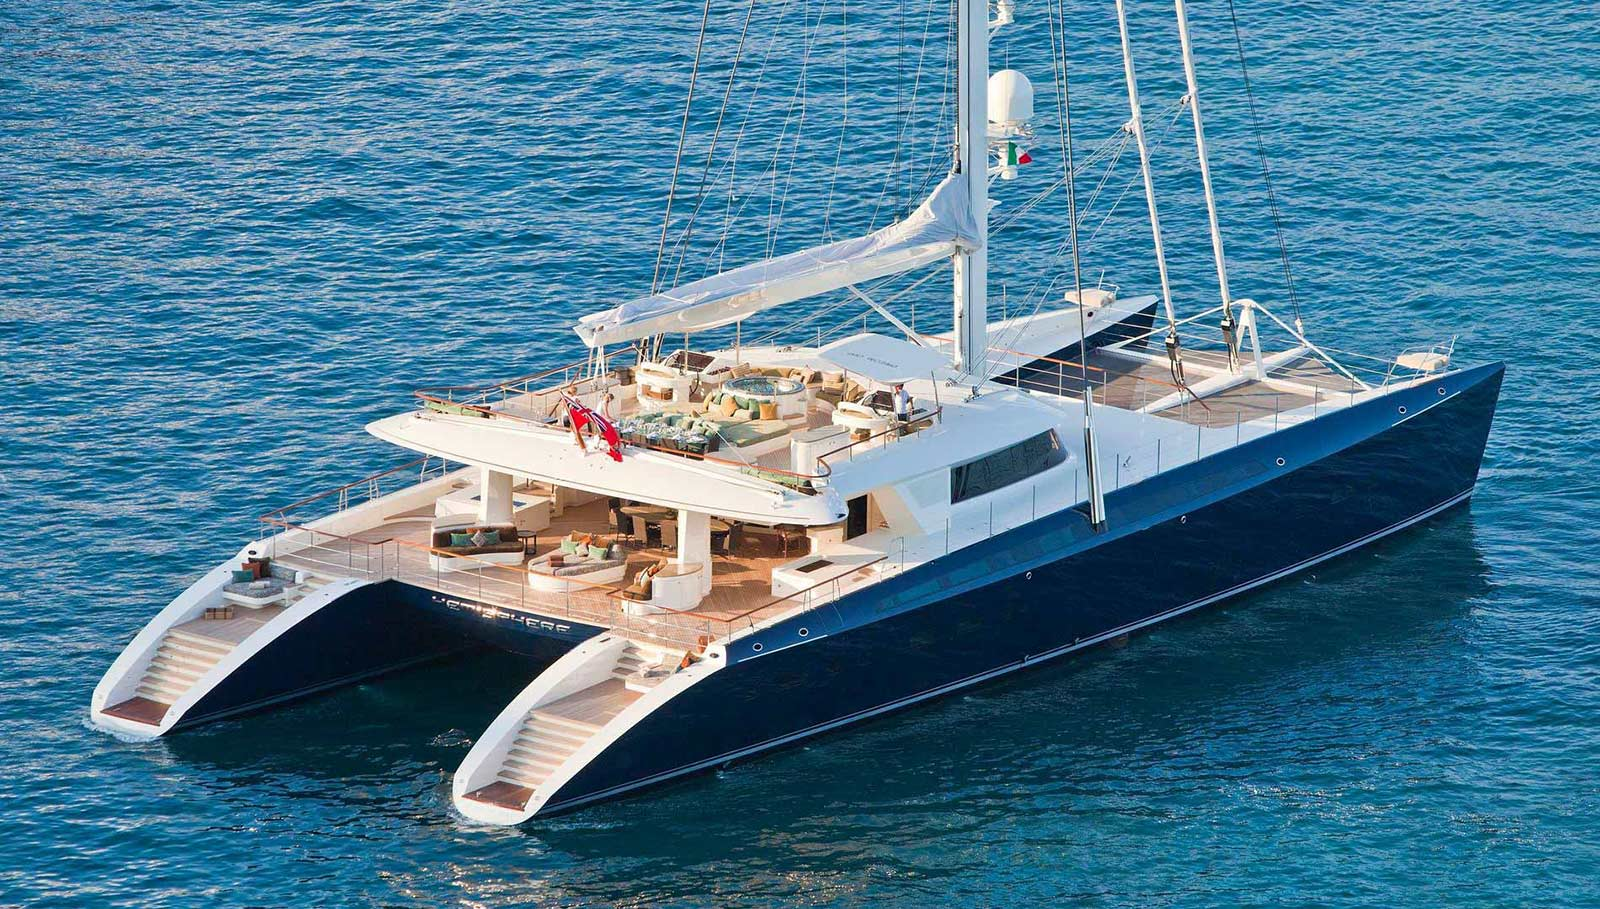 Hemisphere - Luxury Yacht Charters in the Caribbean